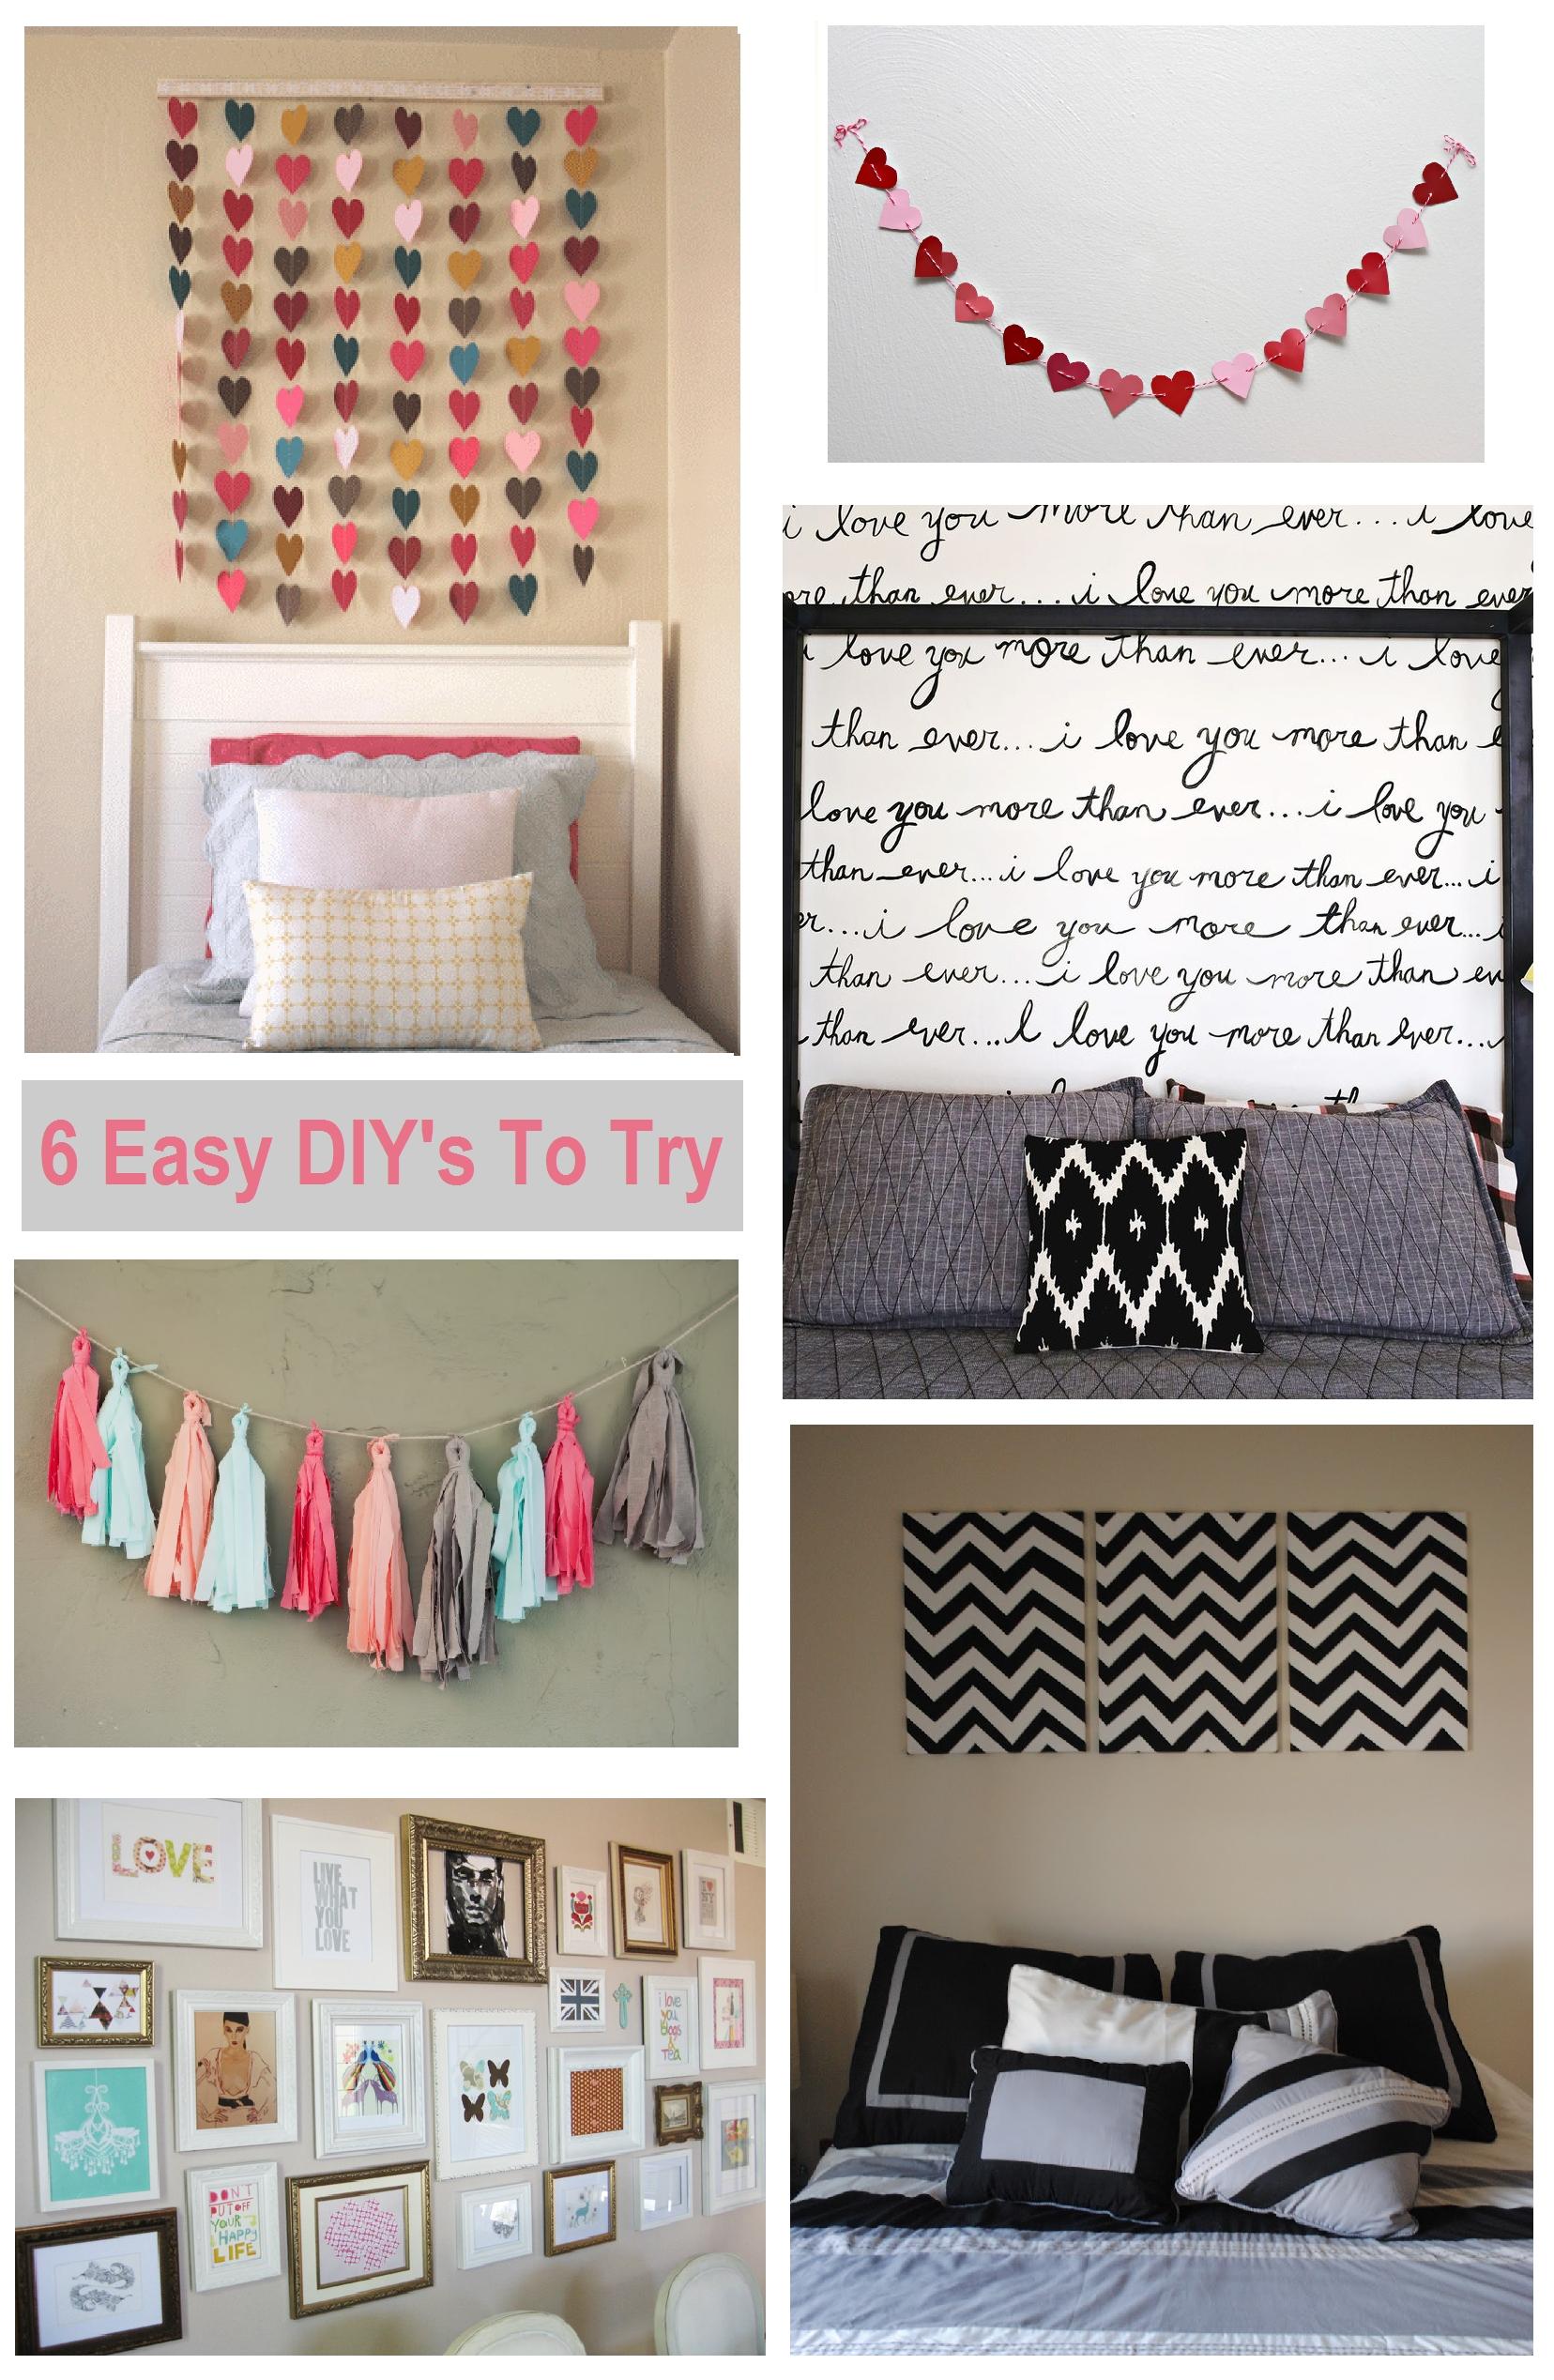 10 Fabulous Diy Decorating Ideas For Bedrooms diy bedroom decor beautiful amazing bed on marvelous diy bedroom 2020